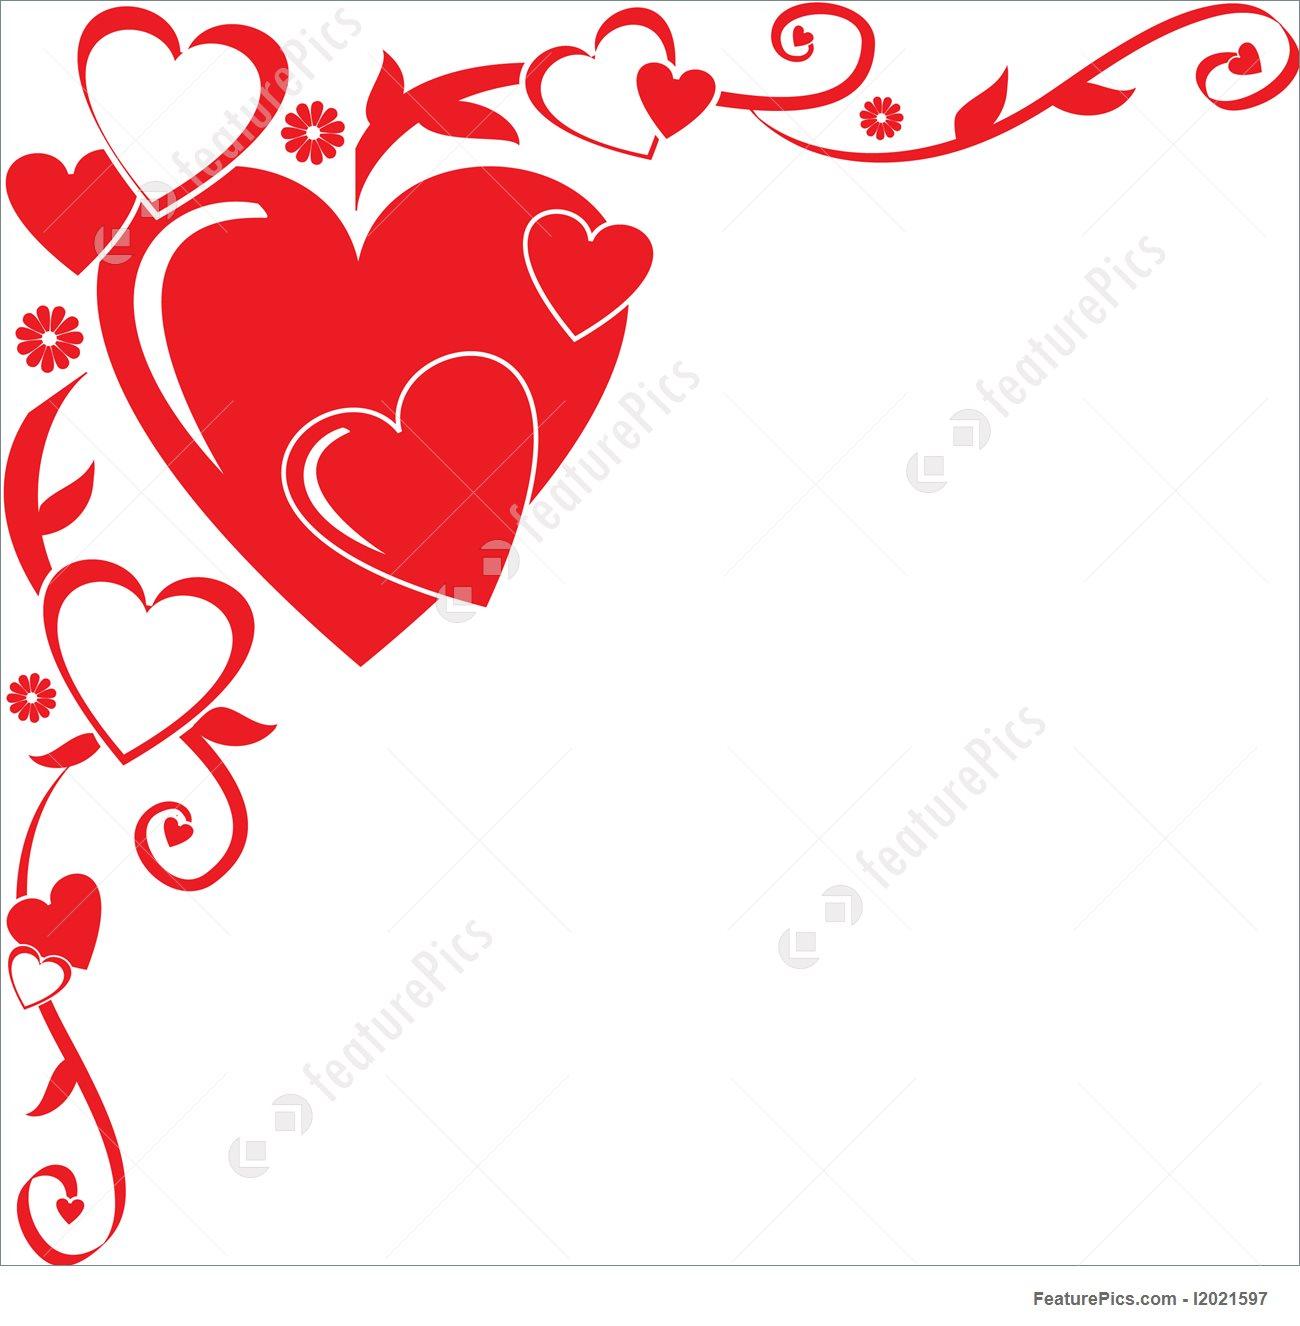 Heart Corner Border | Free download best Heart Corner Border on ...